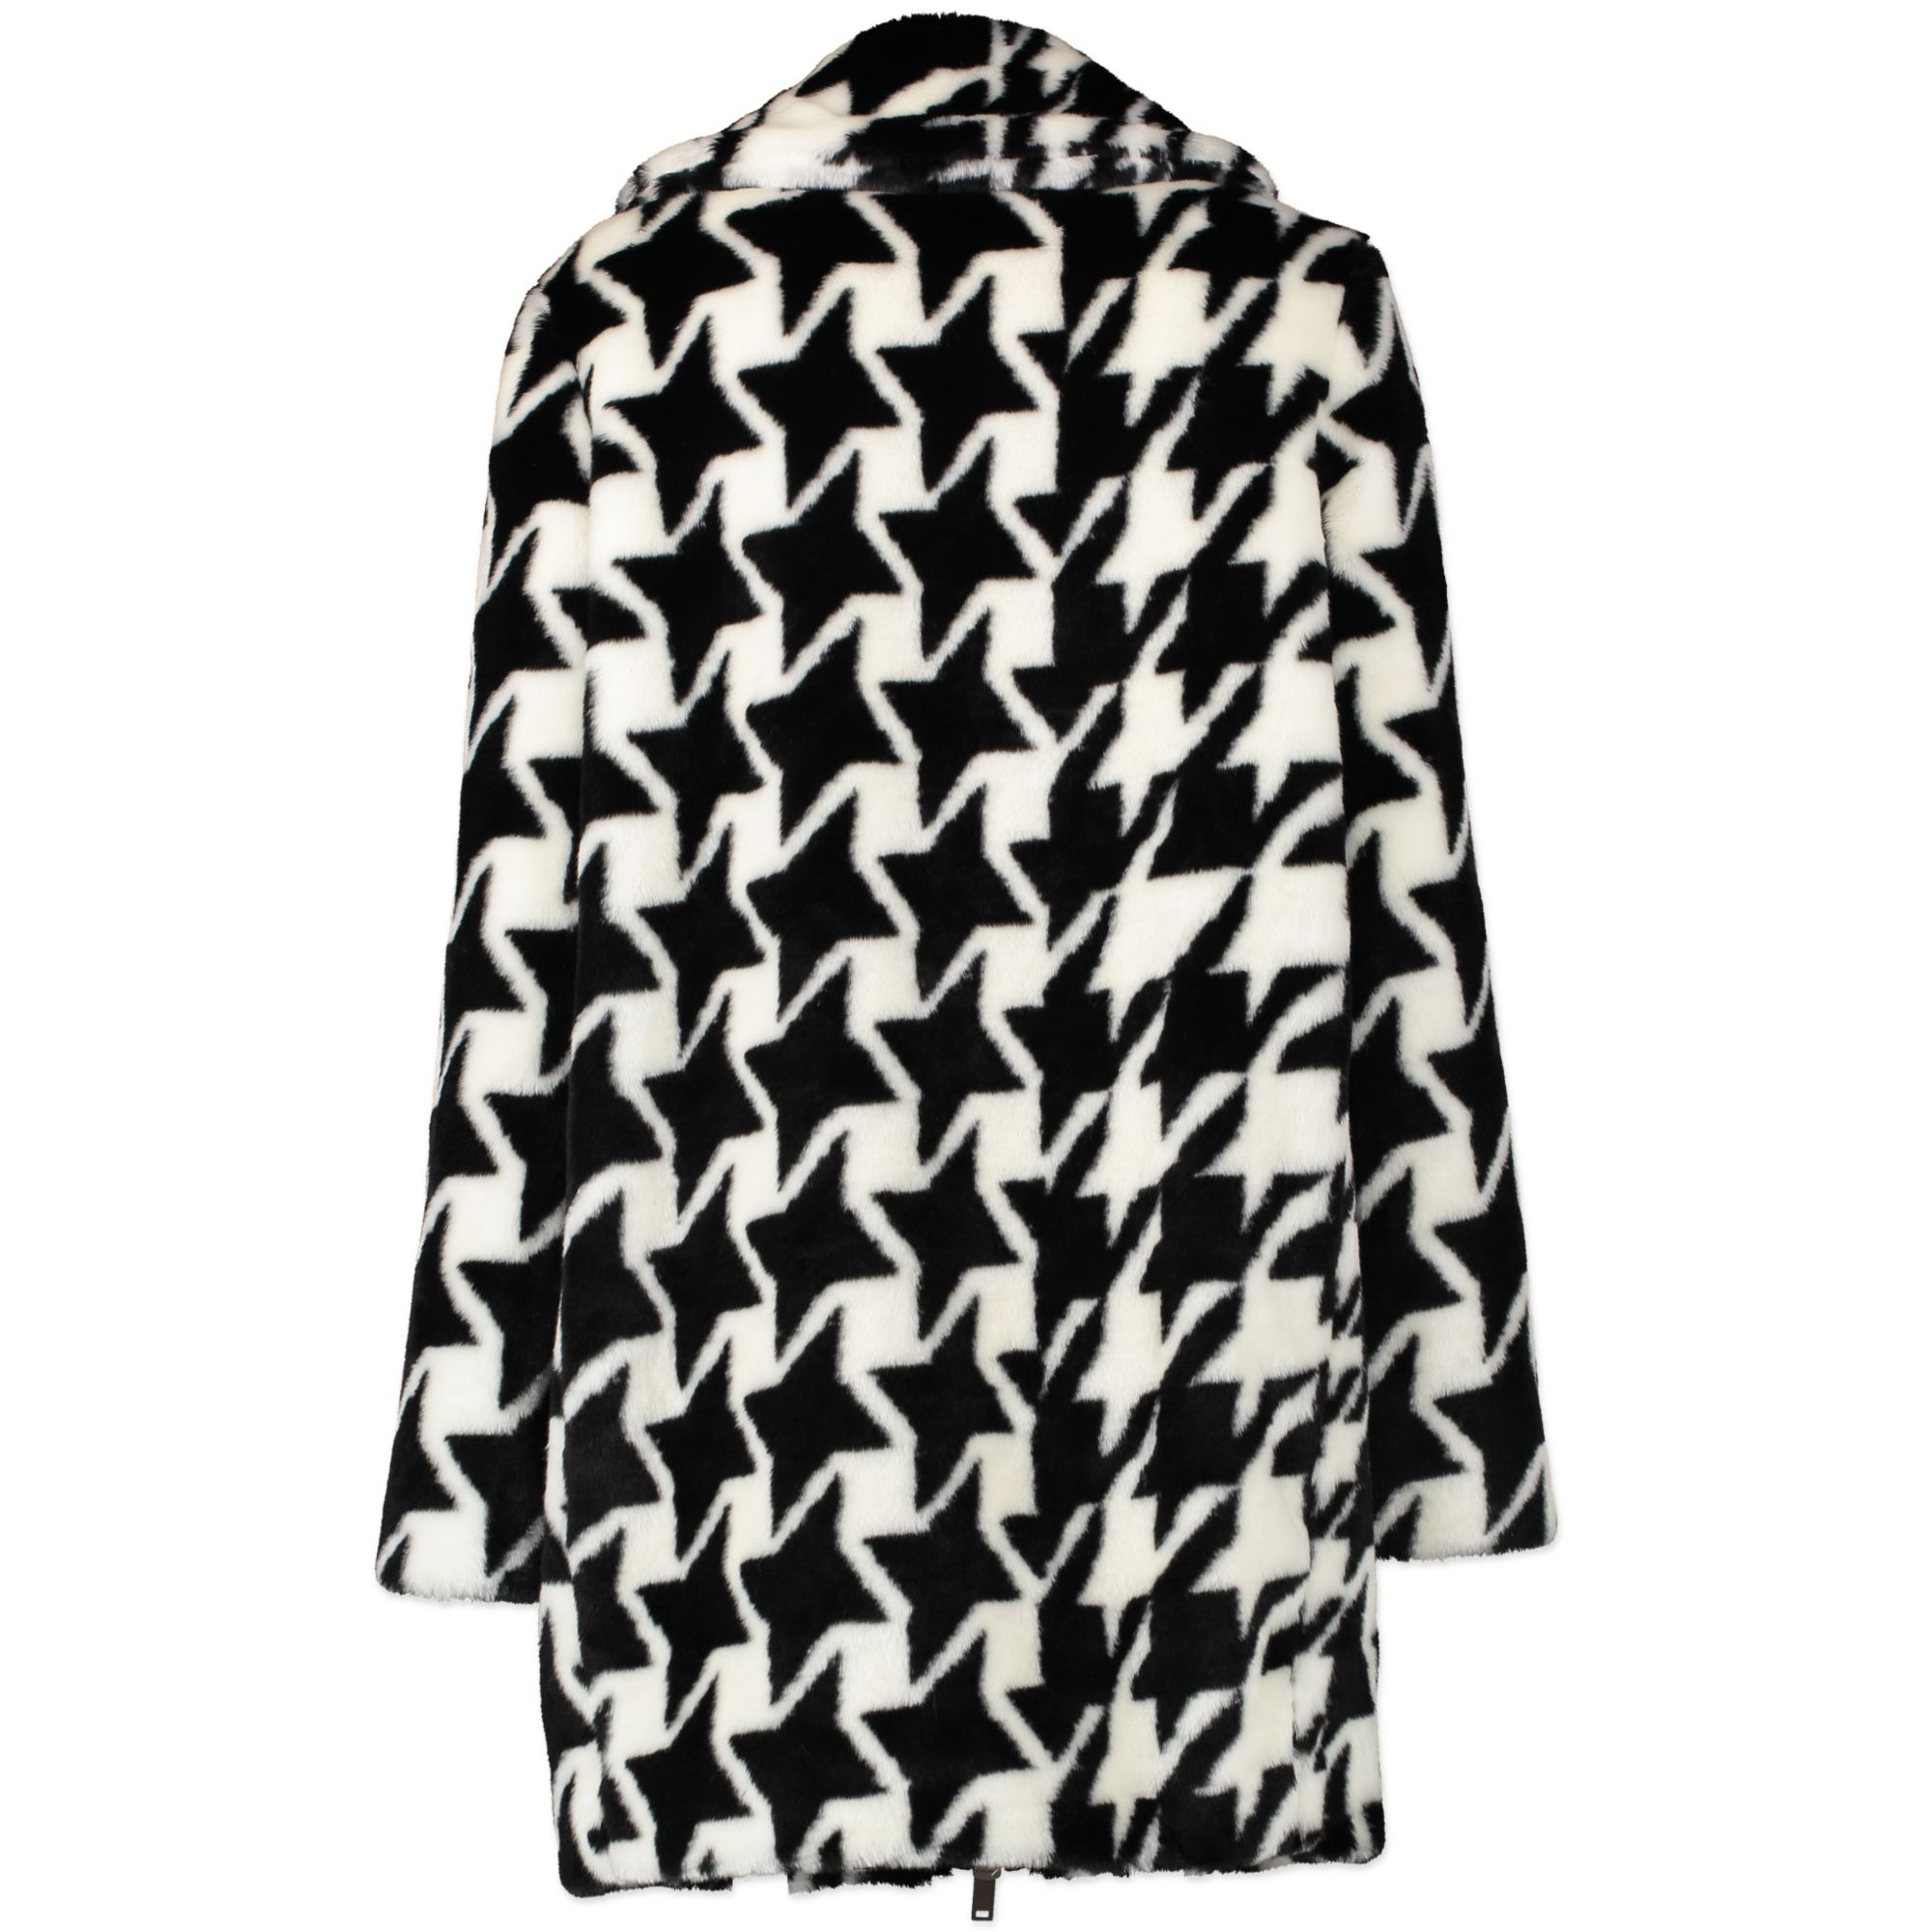 Authentic secondhand Stella McCartney Houndstooth Faux-Fur Coat designer clothing coats designer brands luxury vintage webshop fashion safe secure online shopping worldwide shipping